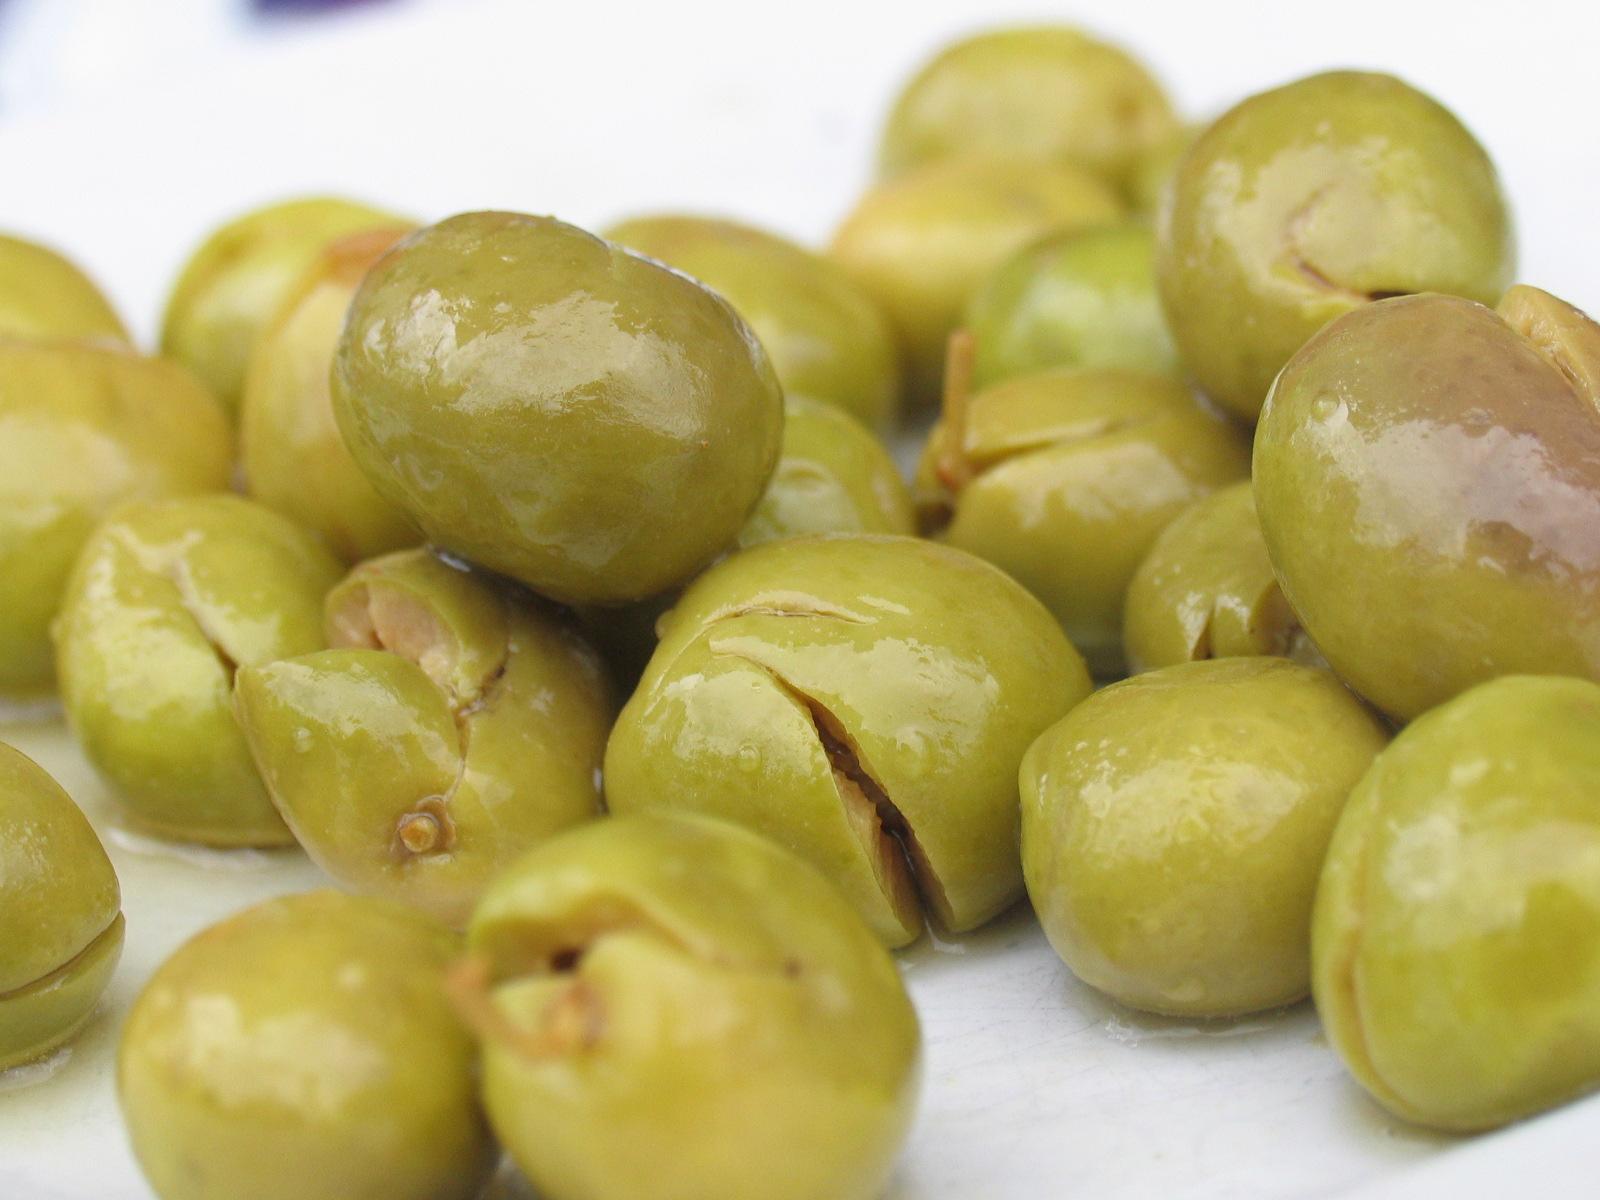 curar-olivas-salmuera